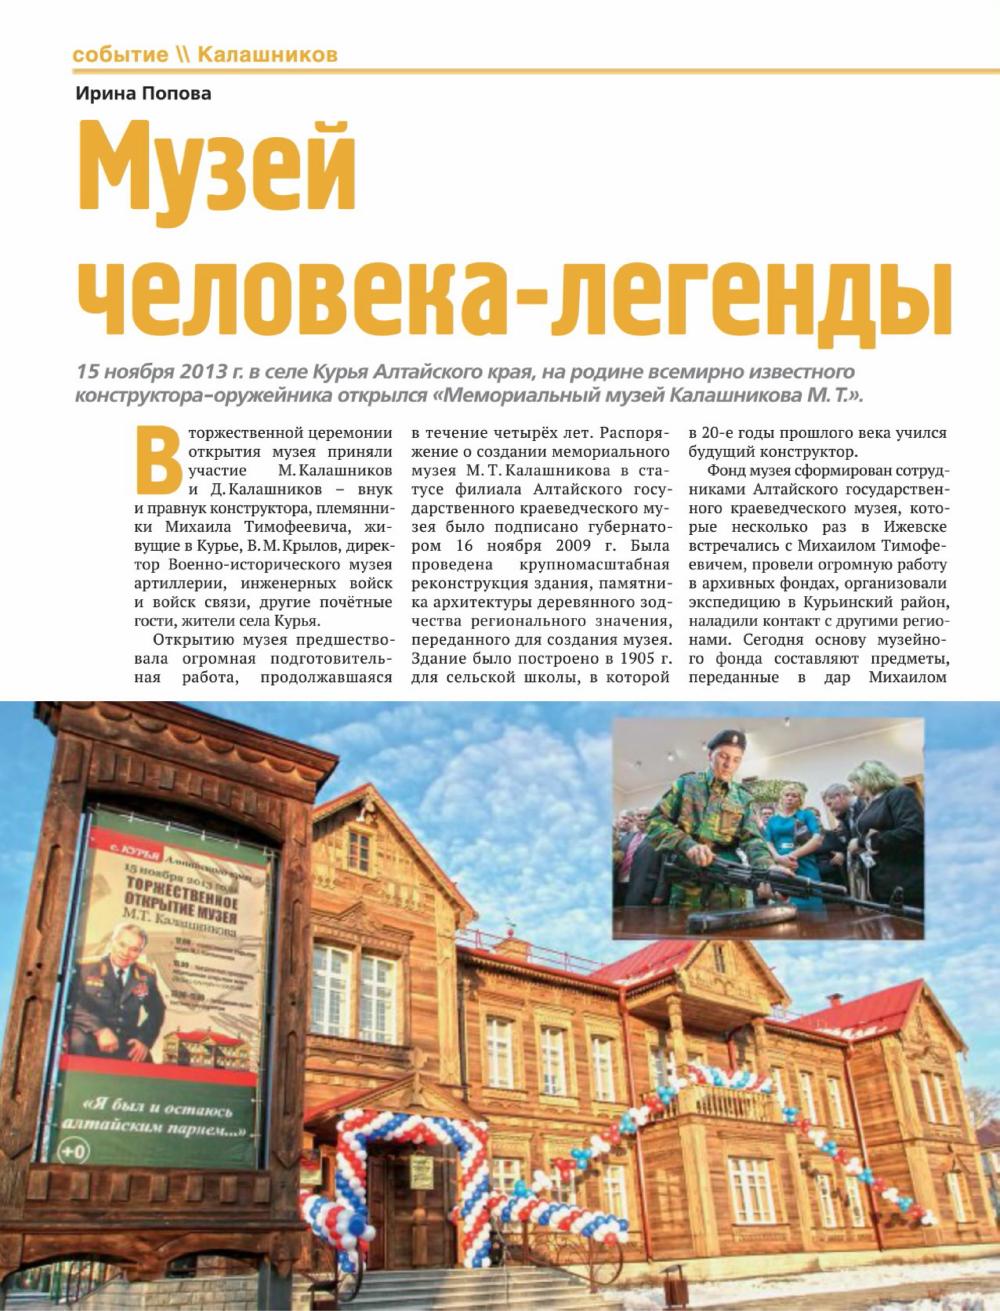 http://i5.imageban.ru/out/2013/12/27/21741c1a0d368c72abd3e6e25b1b6197.jpg